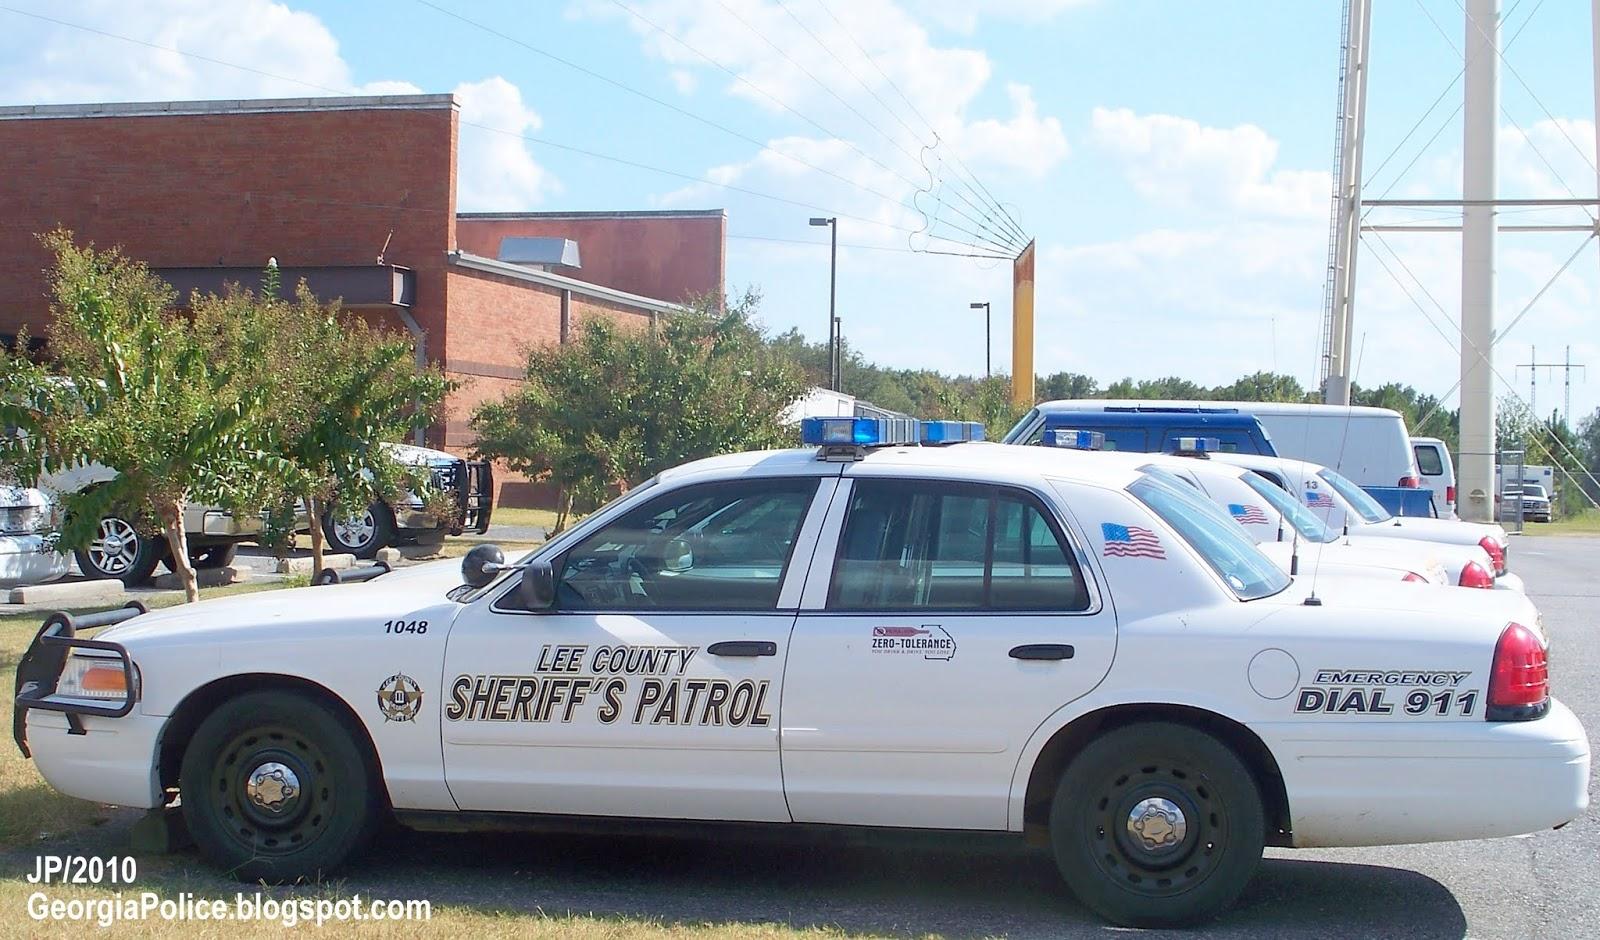 Alabama lee county salem - Lee County Georgia Sheriff Department Leesburg Georgia Lee County Sheriff Patrol Car Leesburg Jail